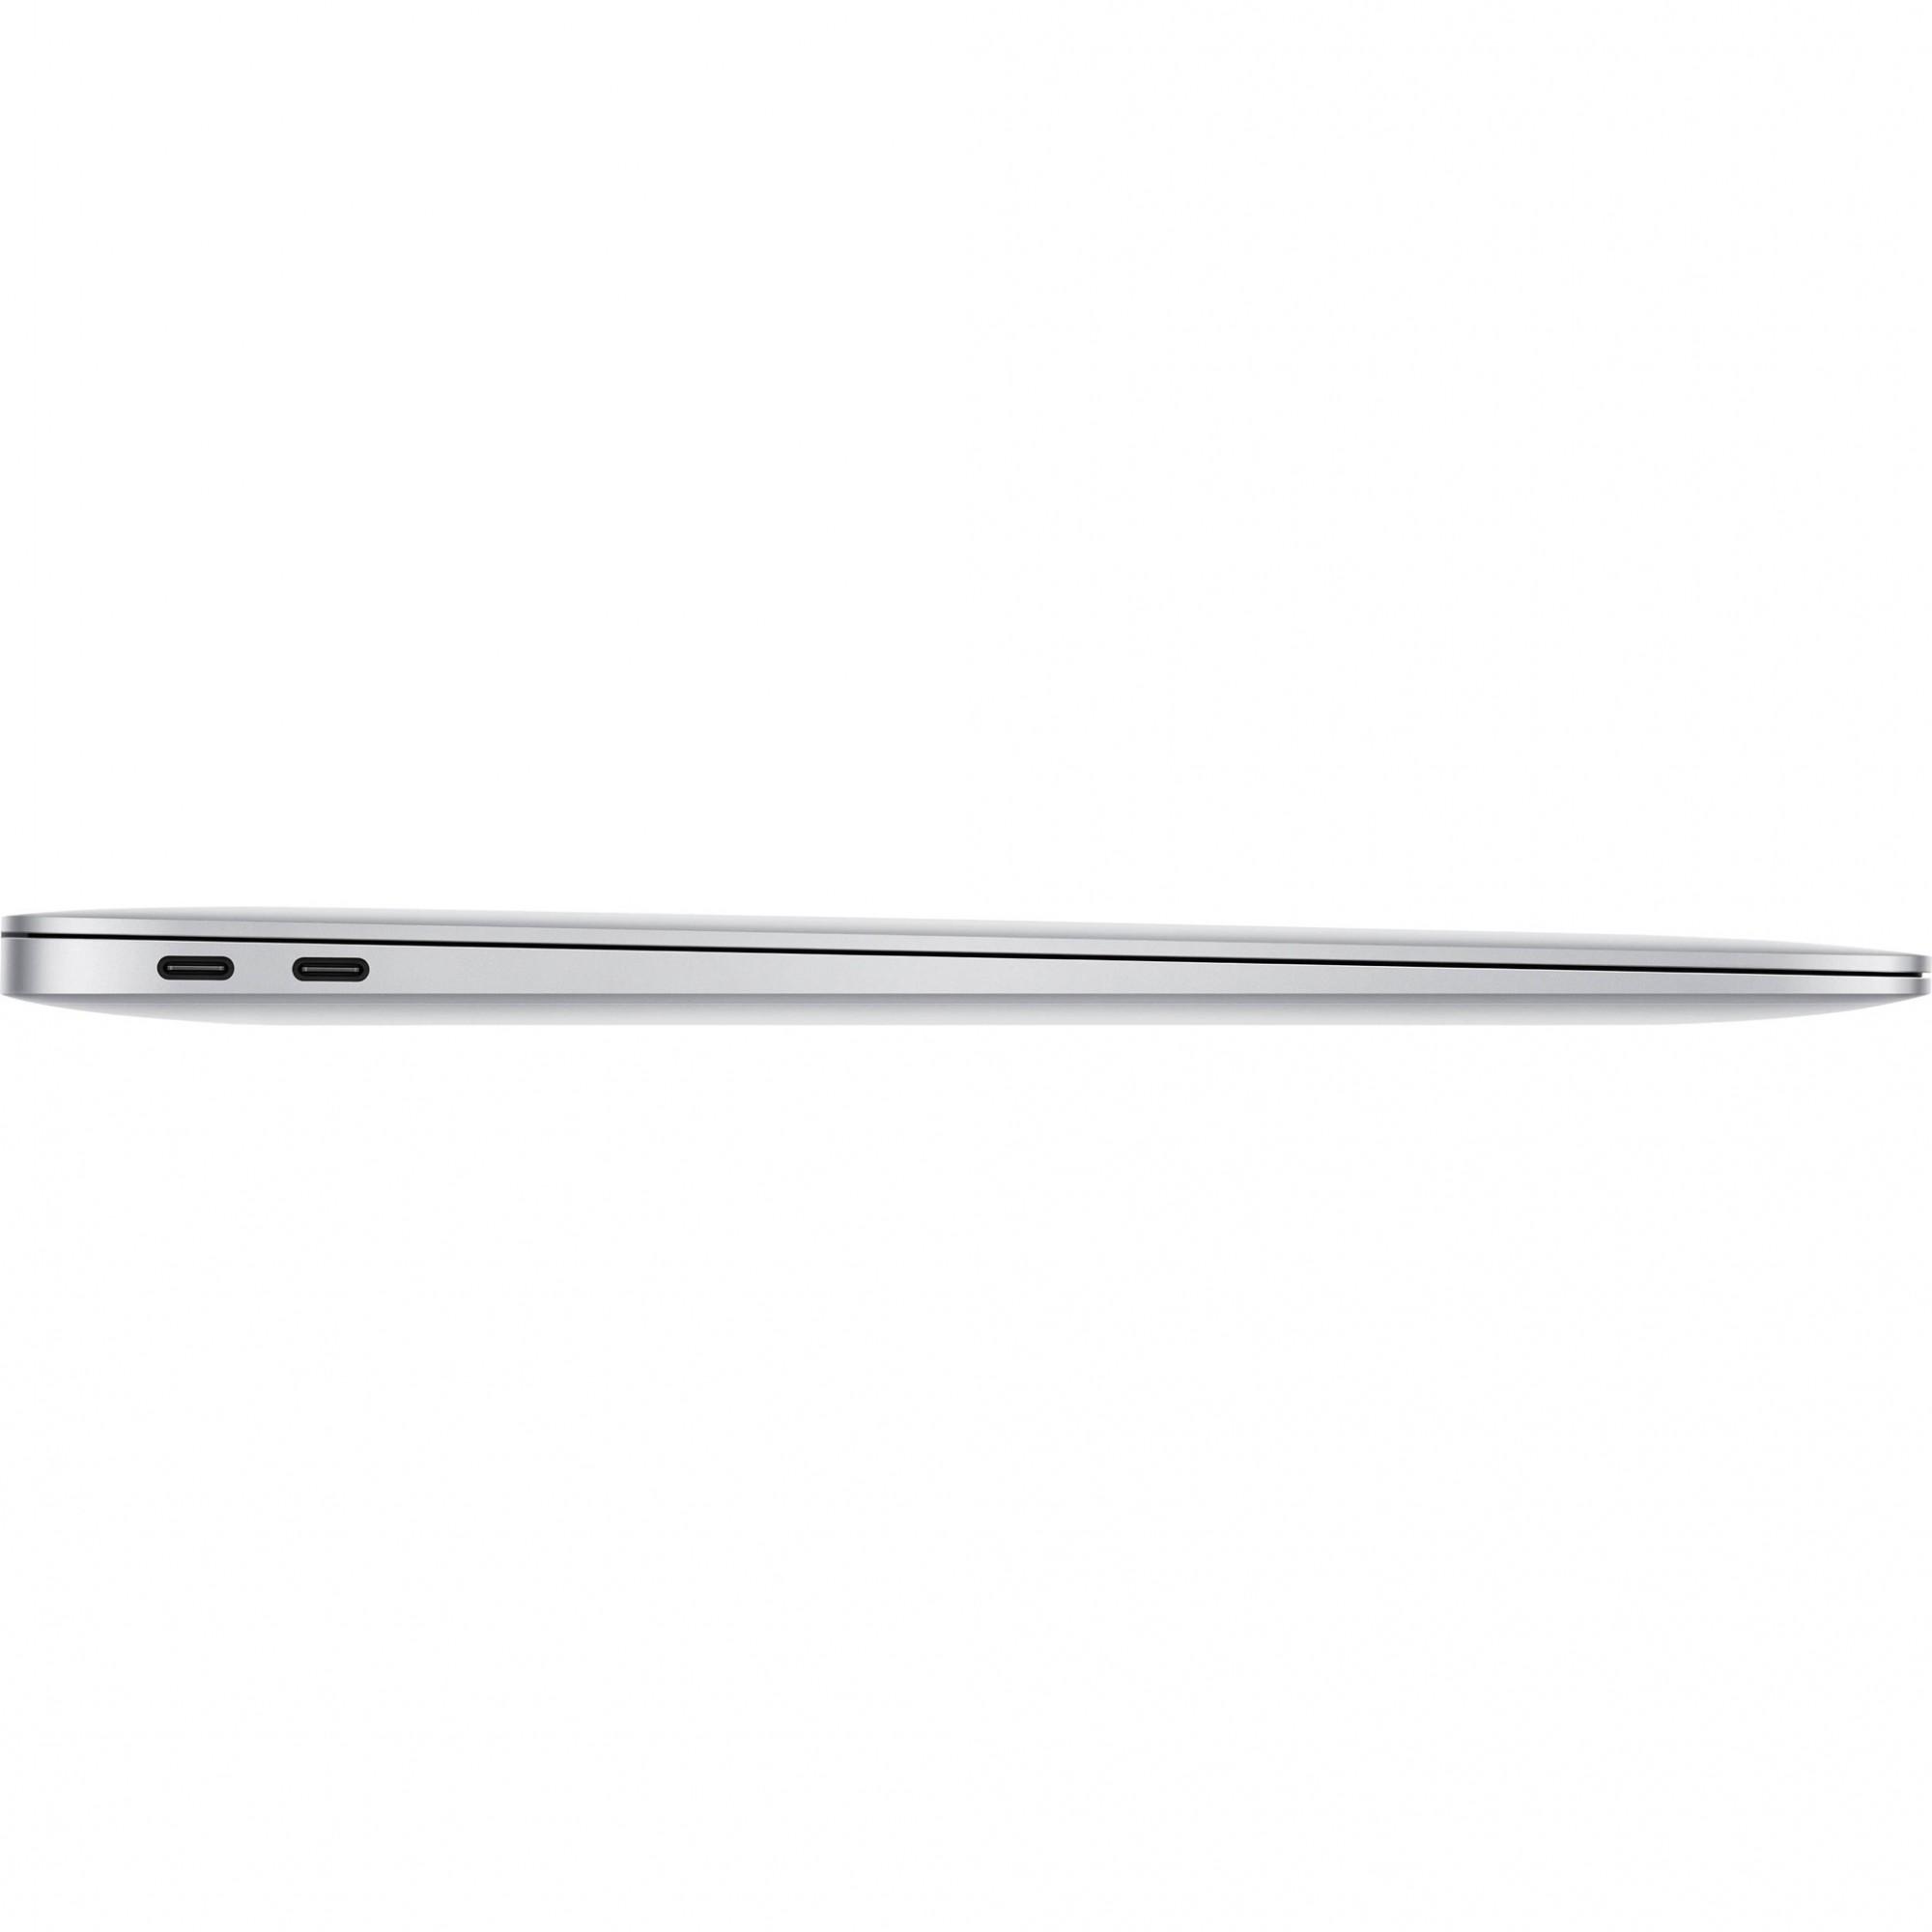 "MacBook Air 2018 Apple Core i5 8GB 128GB SSD Tela 13.3""  MacOS - Usado"